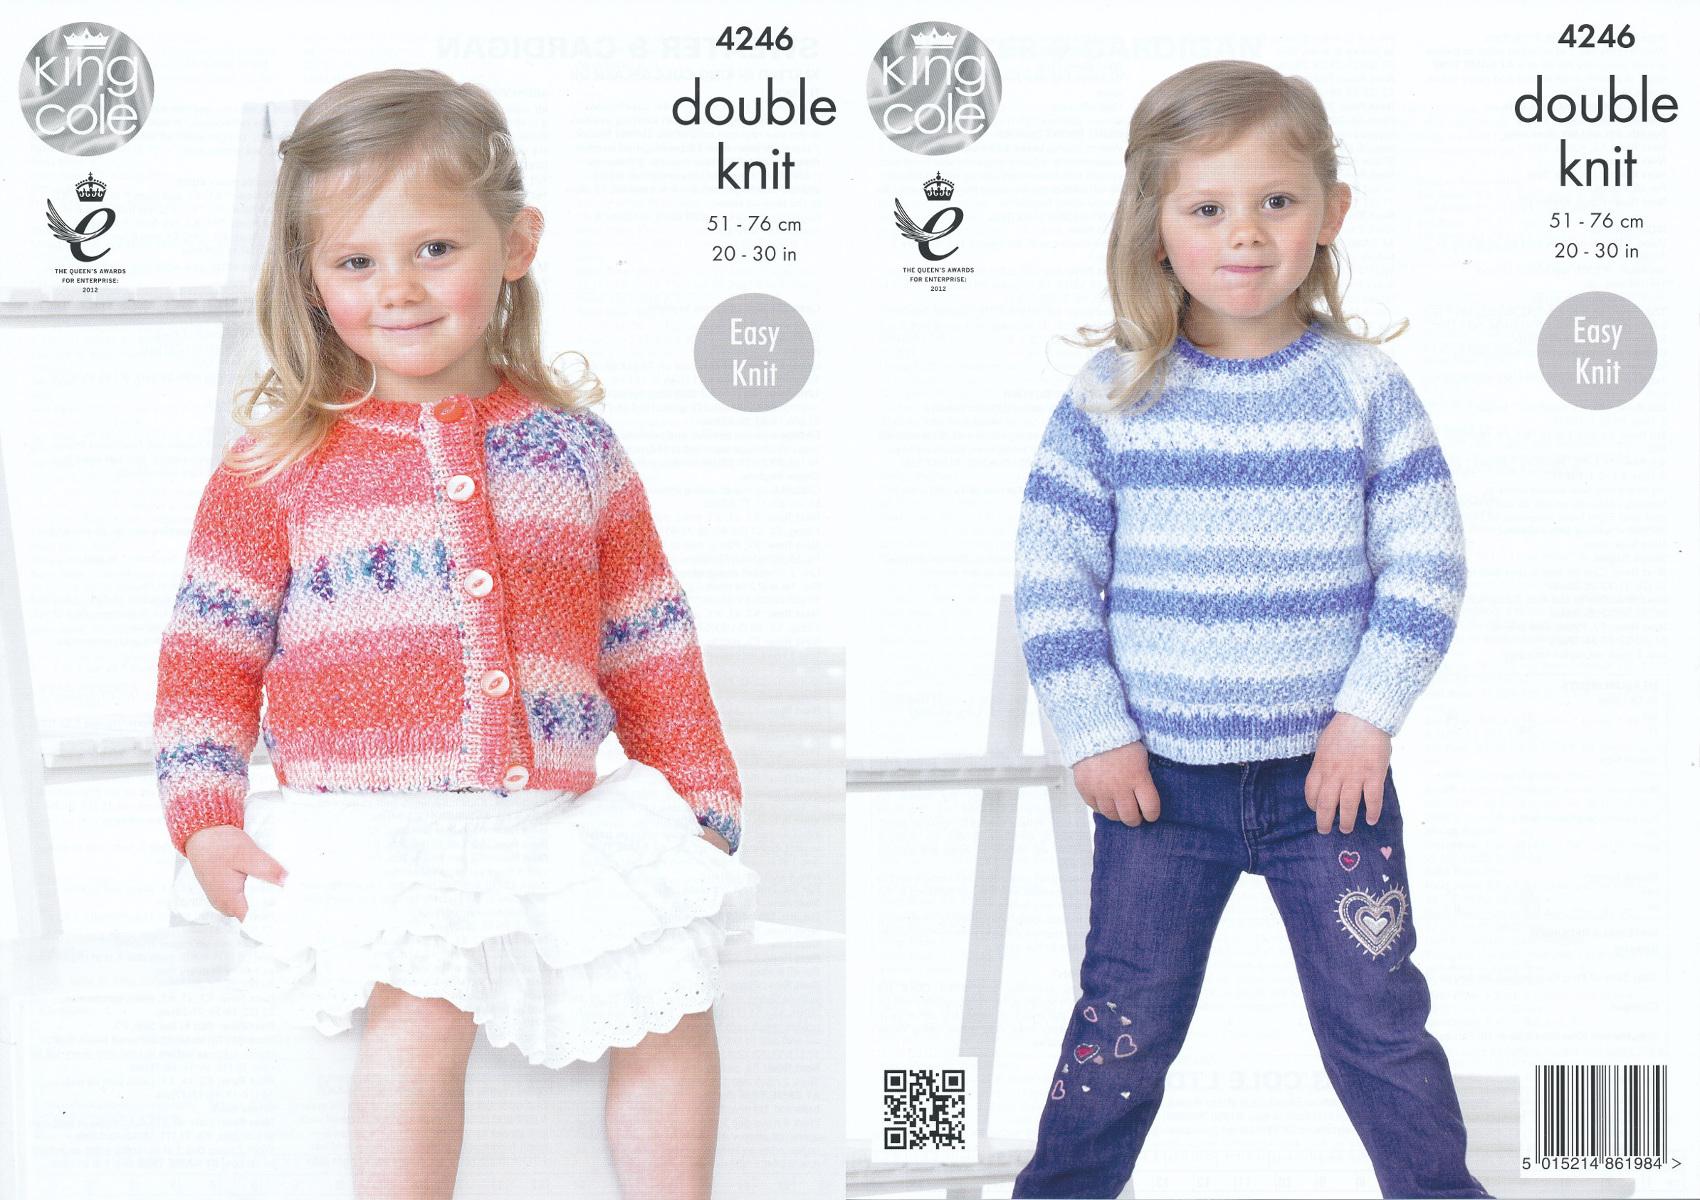 King Cole Splash DK Double Knitting Pattern Kids Girls Cardigan ...